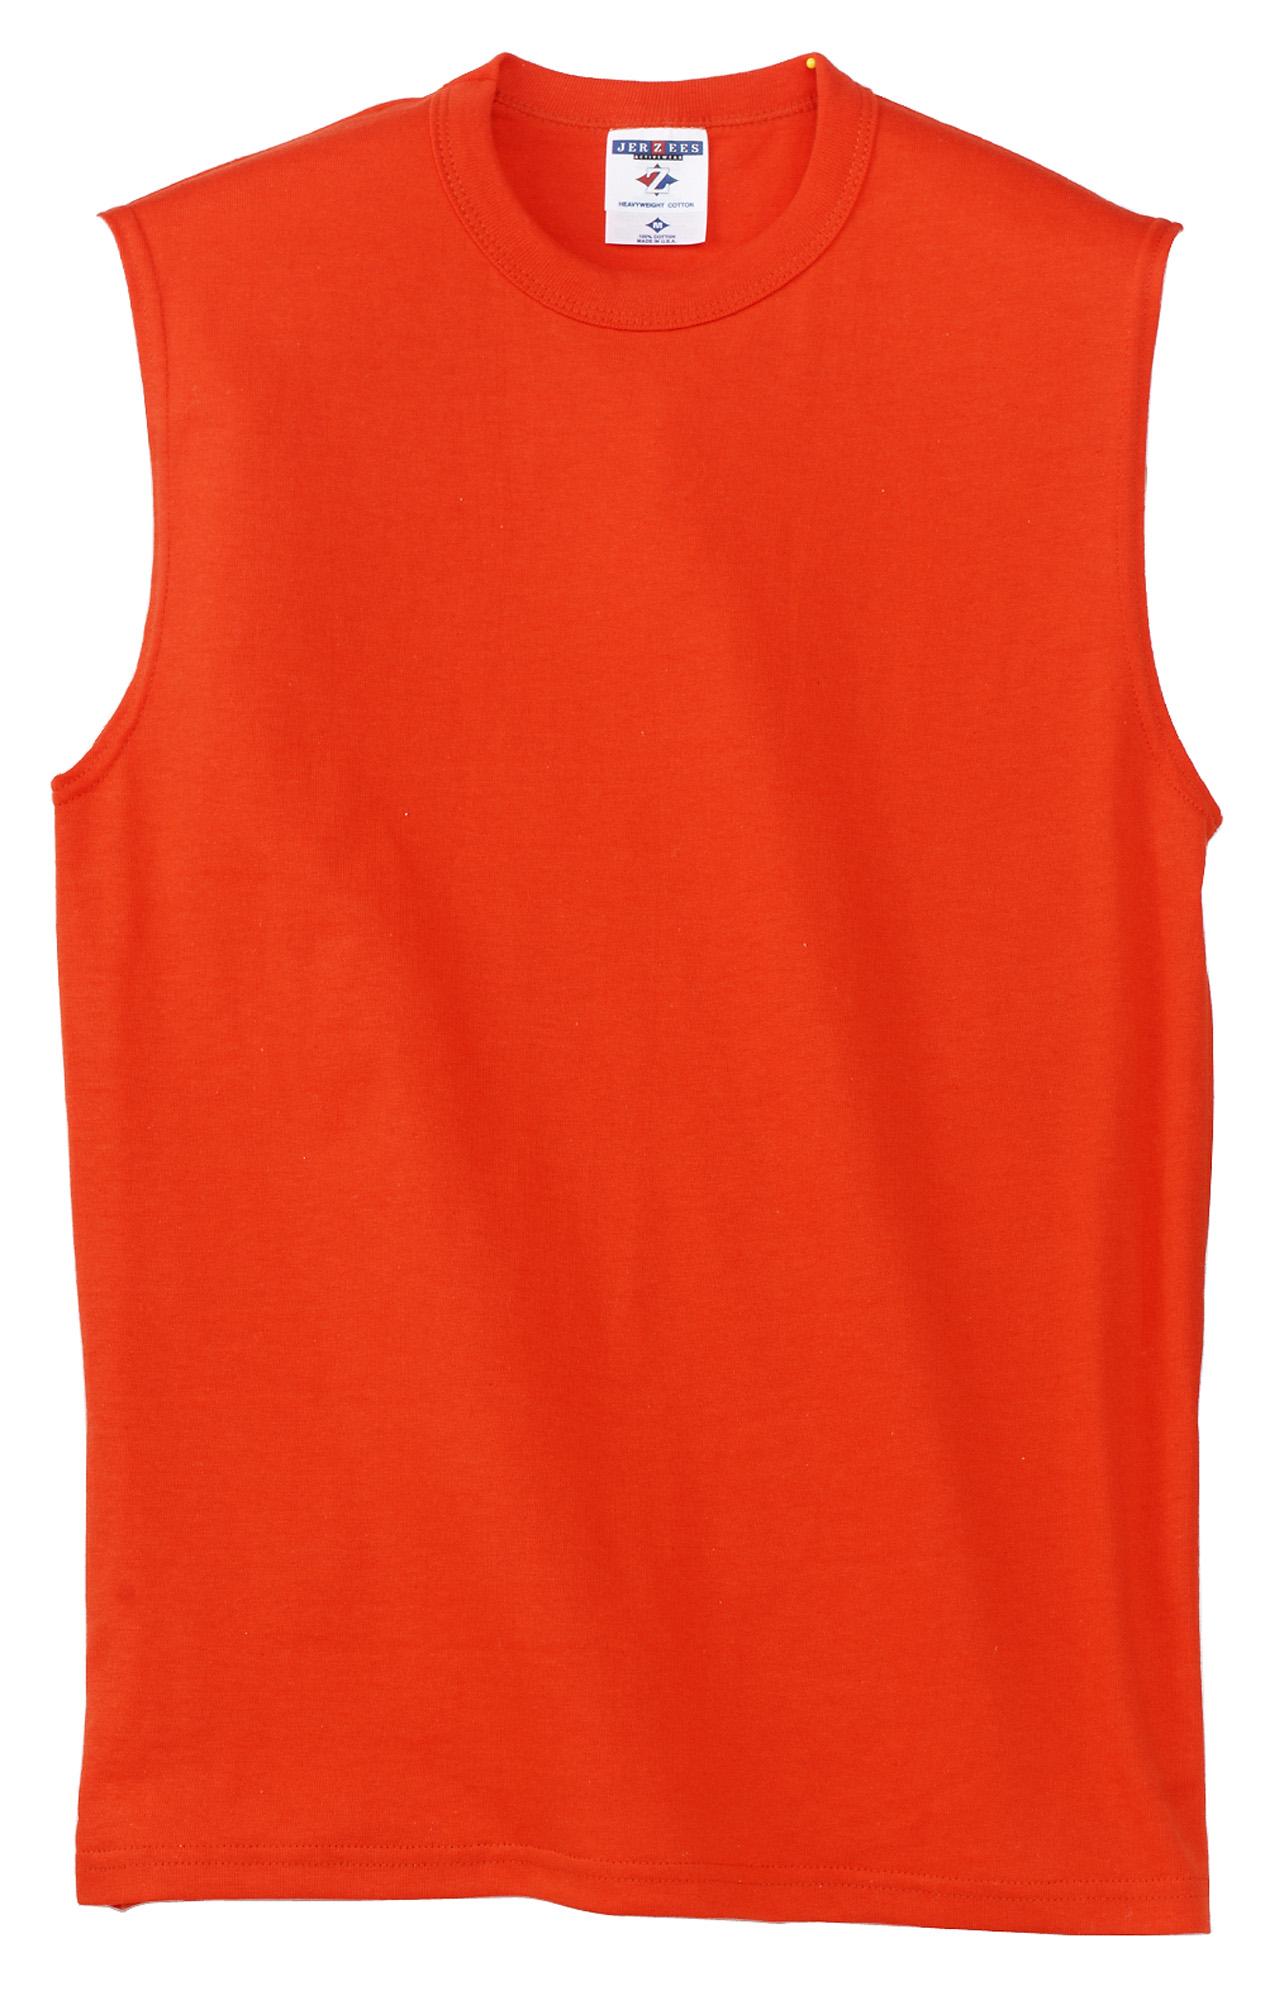 JERZEES® – HiDensi-T™ 100% Cotton Sleeveless T-Shirt. 49M ...